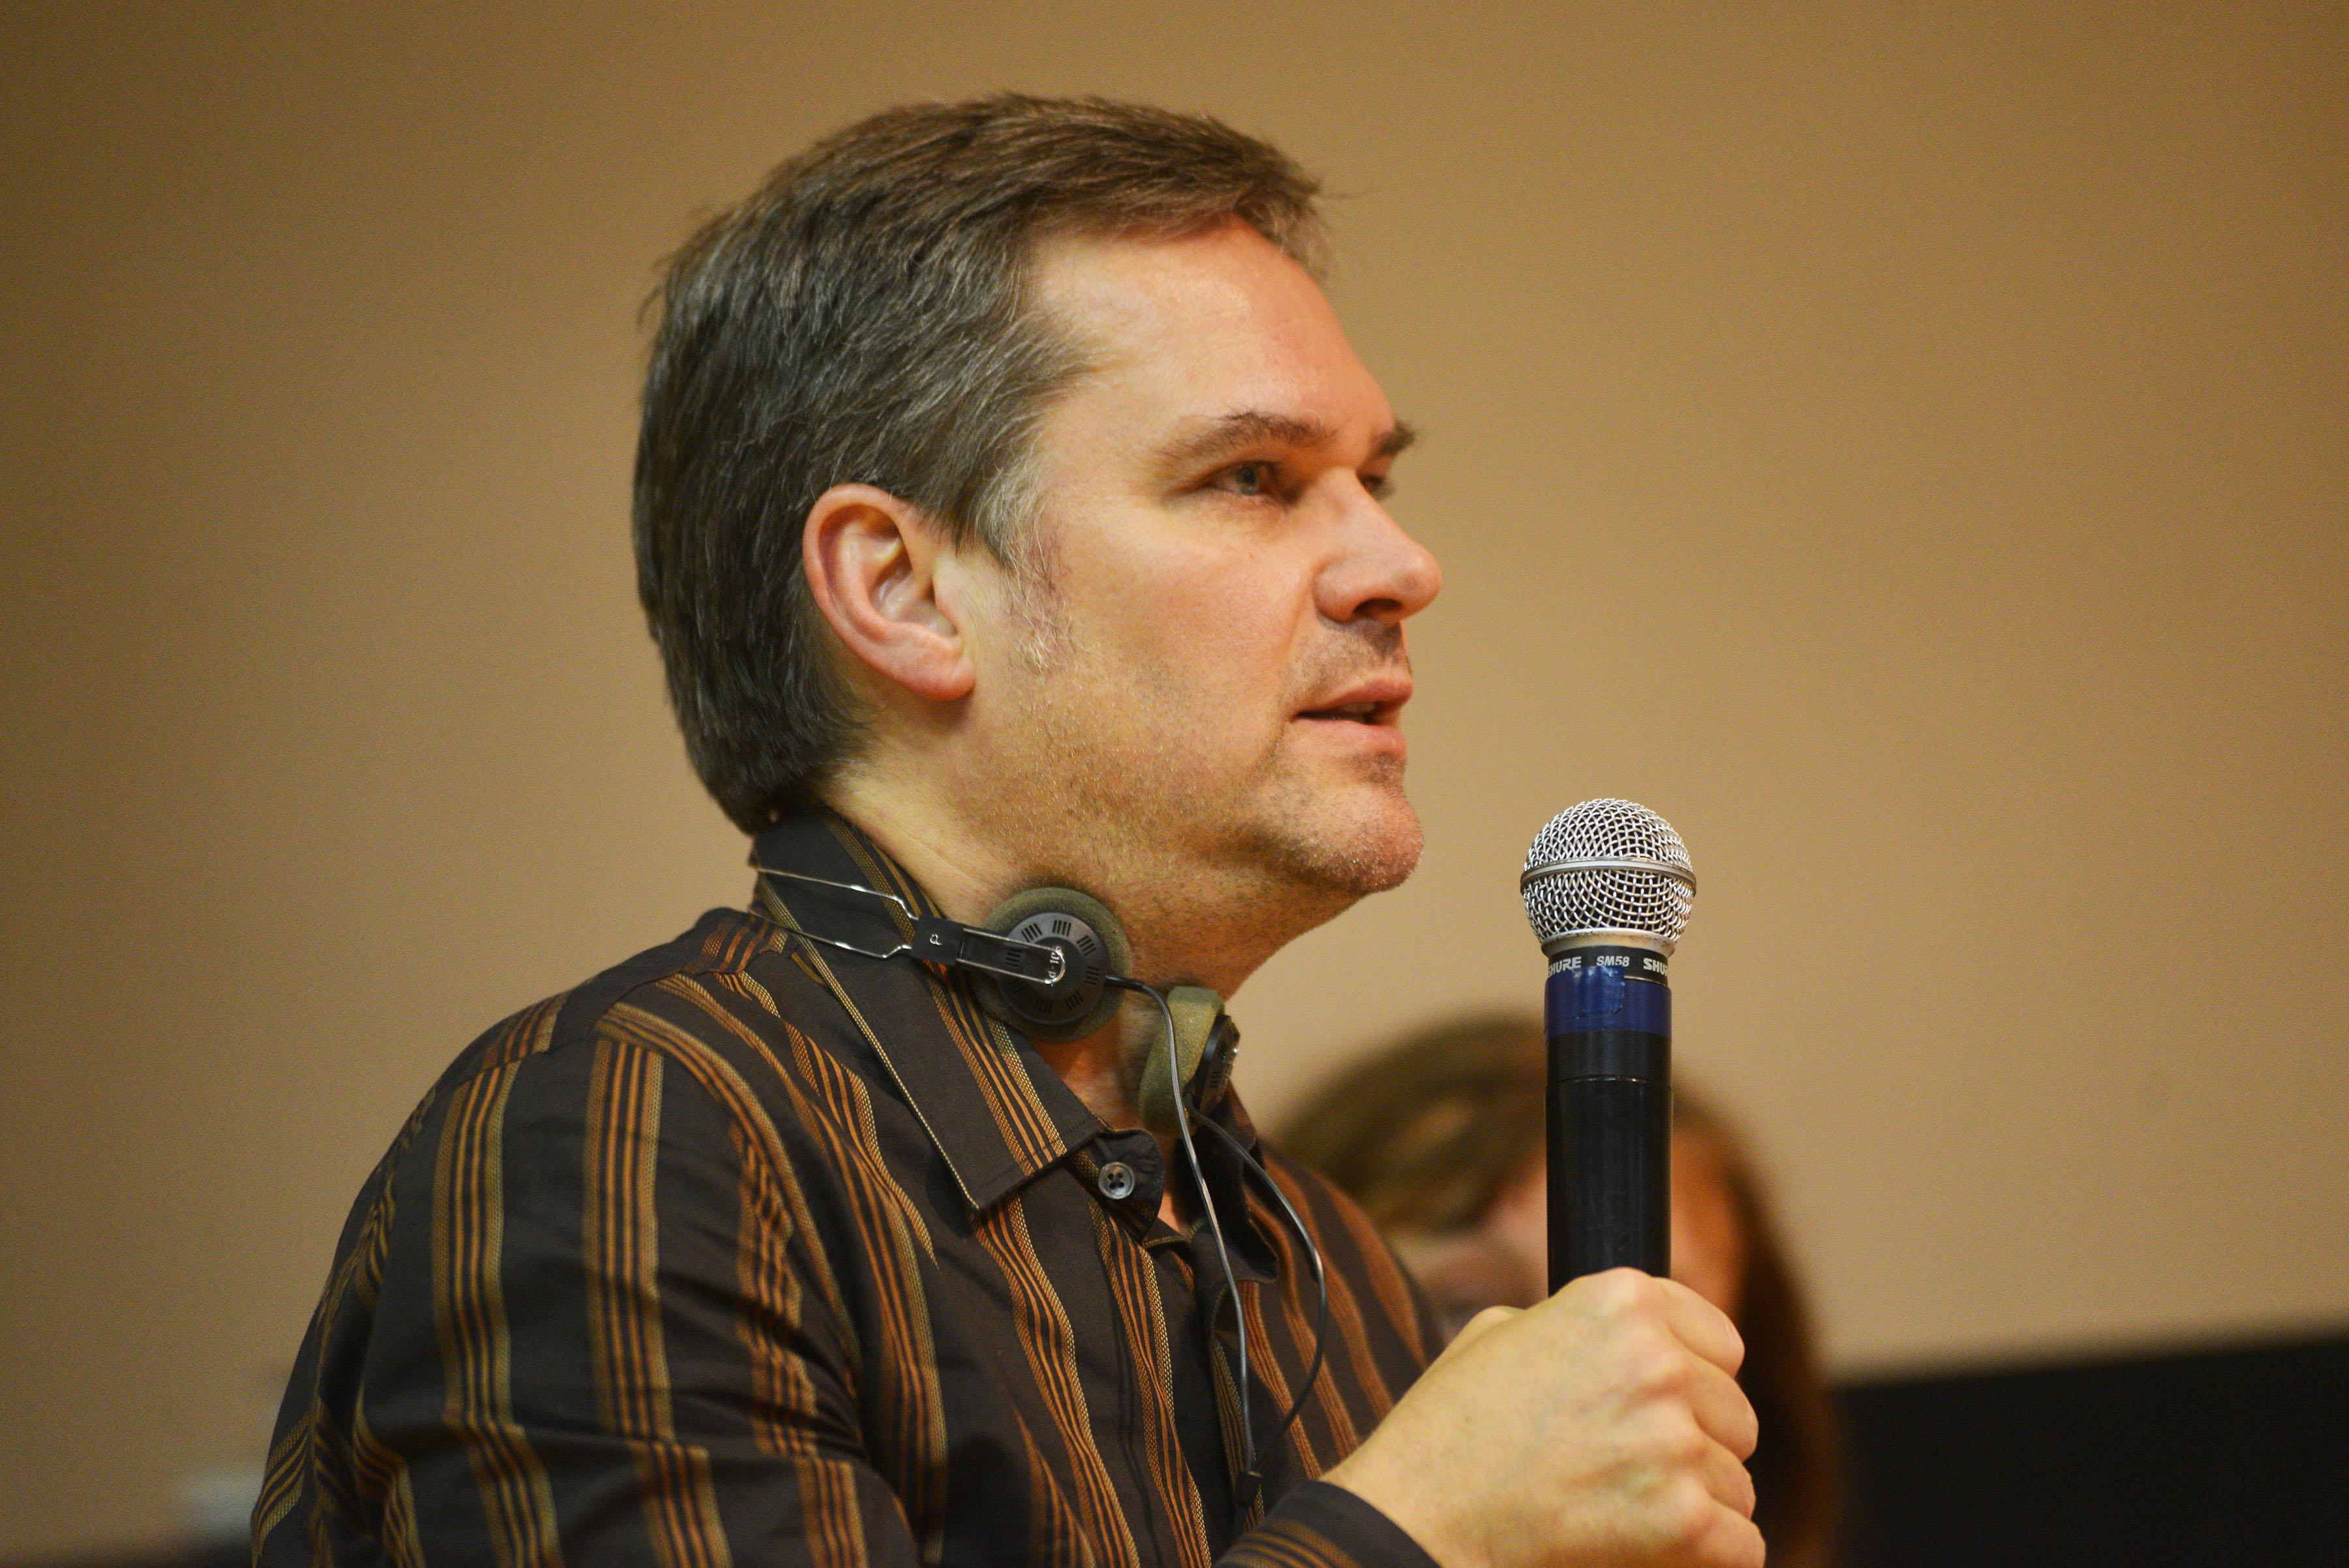 Image of Ruud van Empel from Wikidata